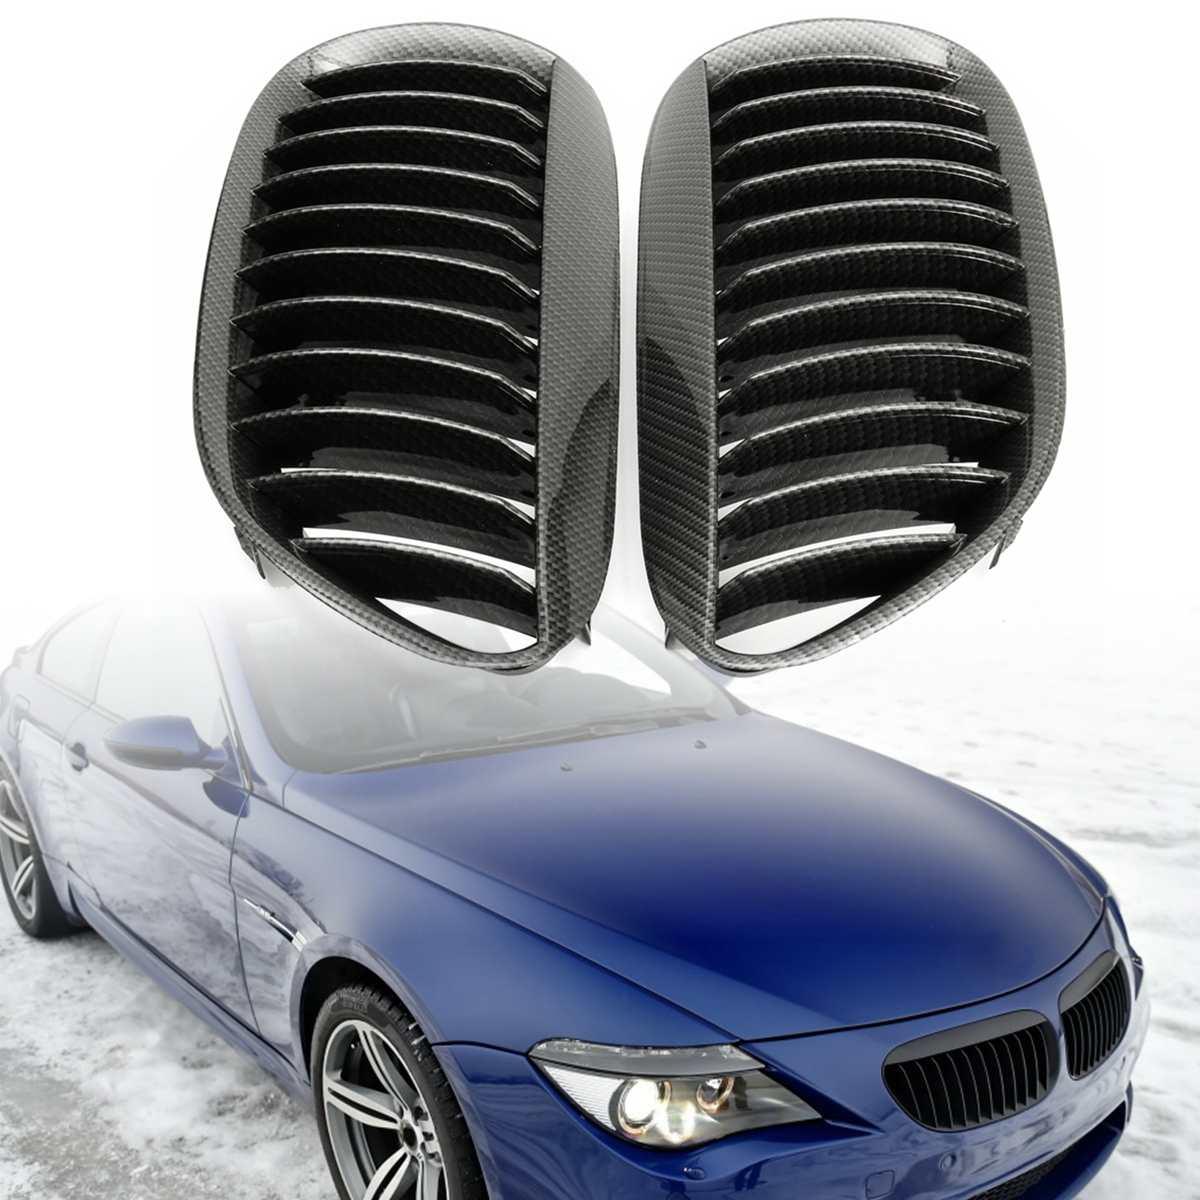 Pair Carbon Grain Grilles Front Right Left For BMW E63 E64 6 Series 2 Door Grille 2003 2004 2005 2006 2007 2008 2009 2010Pair Carbon Grain Grilles Front Right Left For BMW E63 E64 6 Series 2 Door Grille 2003 2004 2005 2006 2007 2008 2009 2010